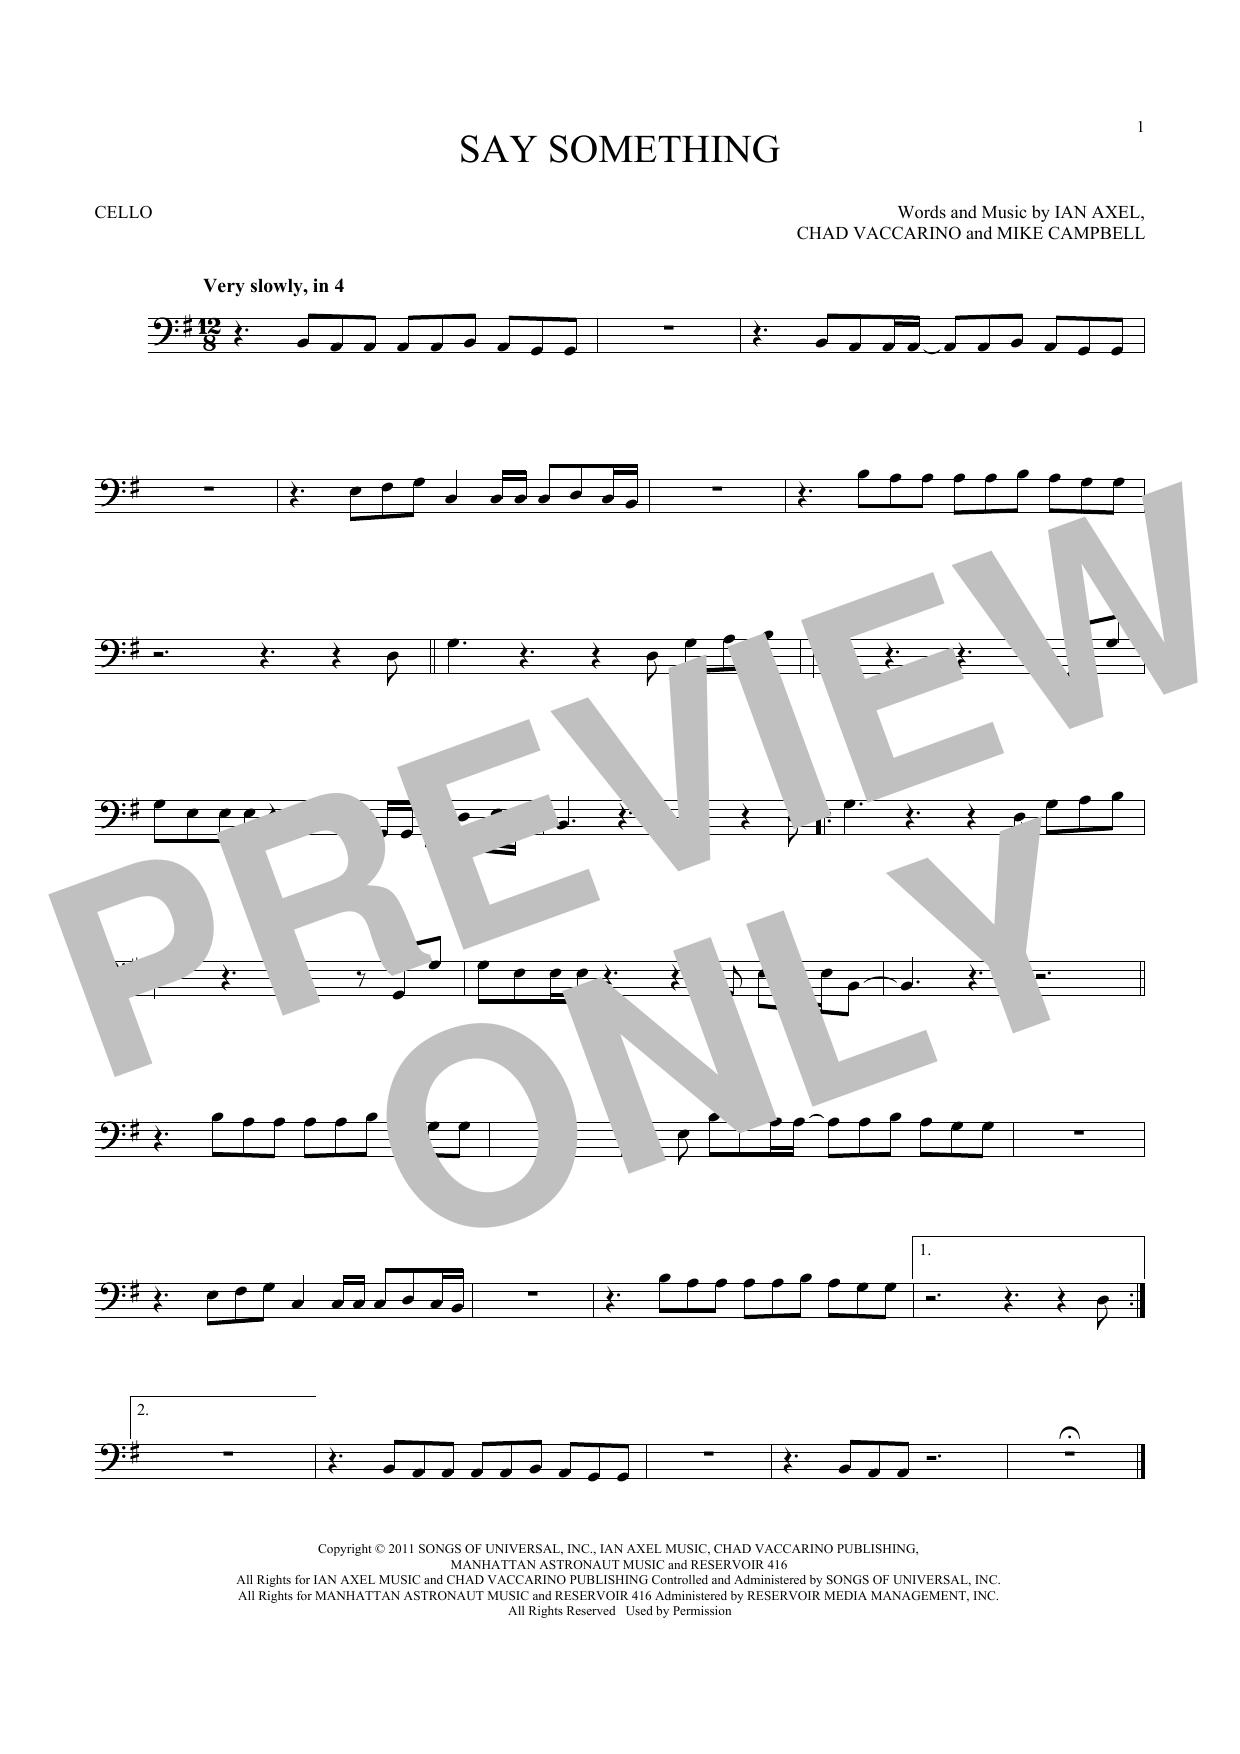 Sheet Music Digital Files To Print Licensed Mike Campbell Digital